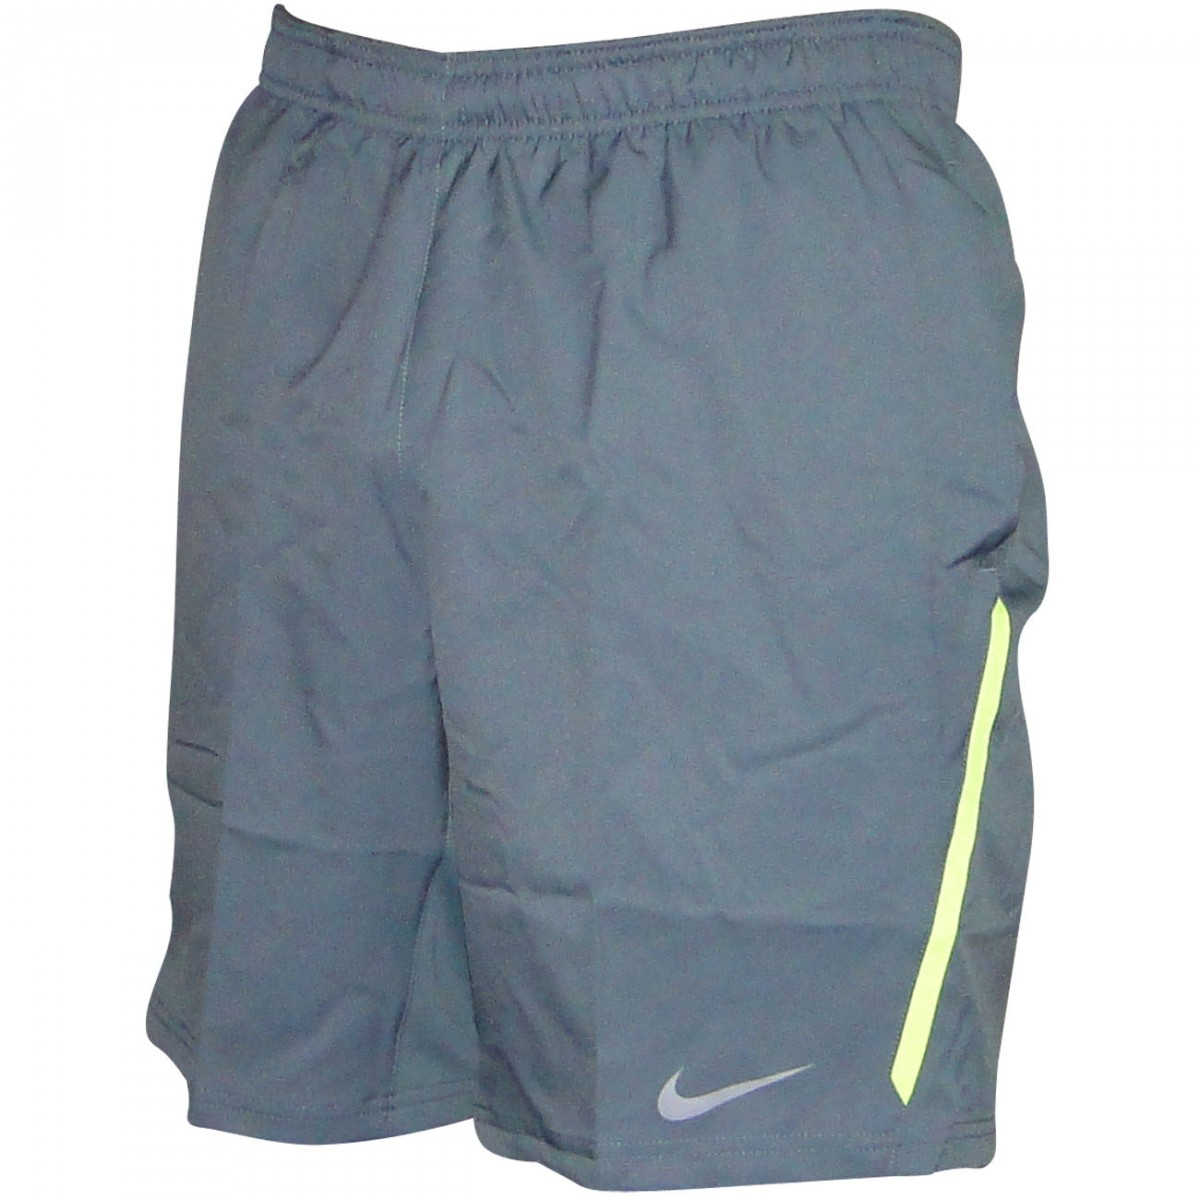 b347e42fe Bermuda Nike 523247 523247-469 - Cinza/Limão - Chuteira Nike, Adidas ...